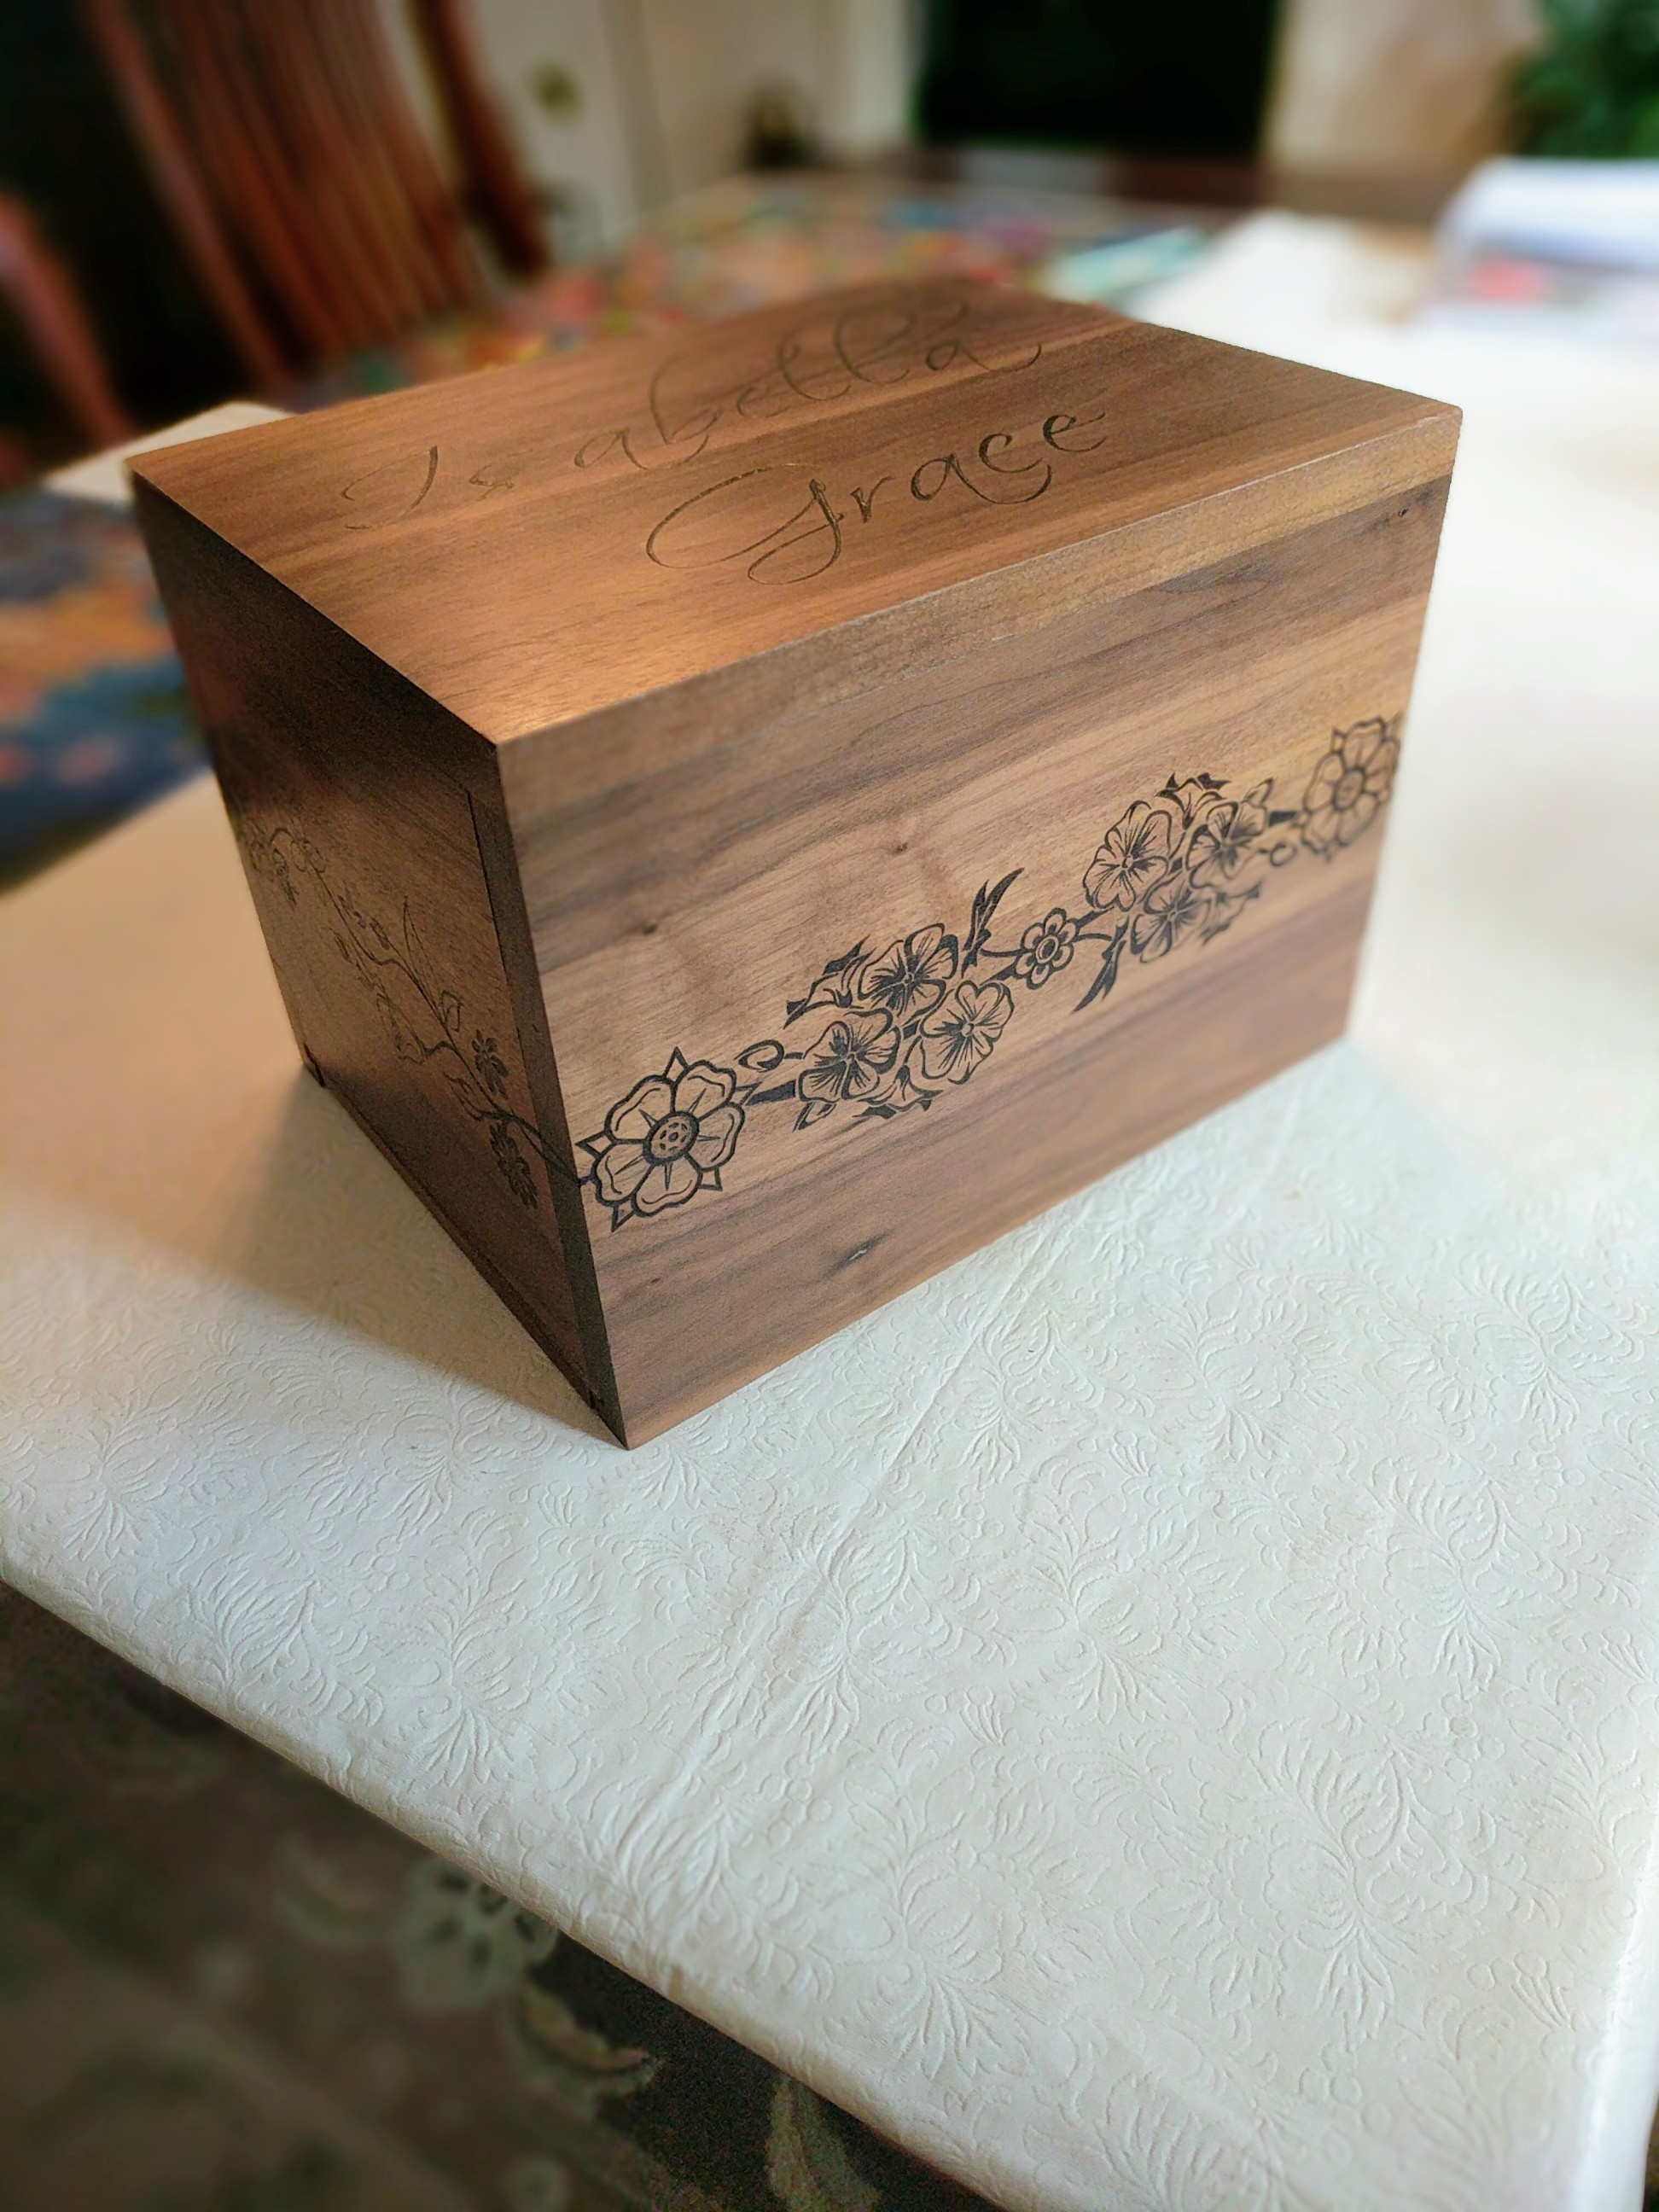 Keepsake Box by Kalman Grof-Tisza